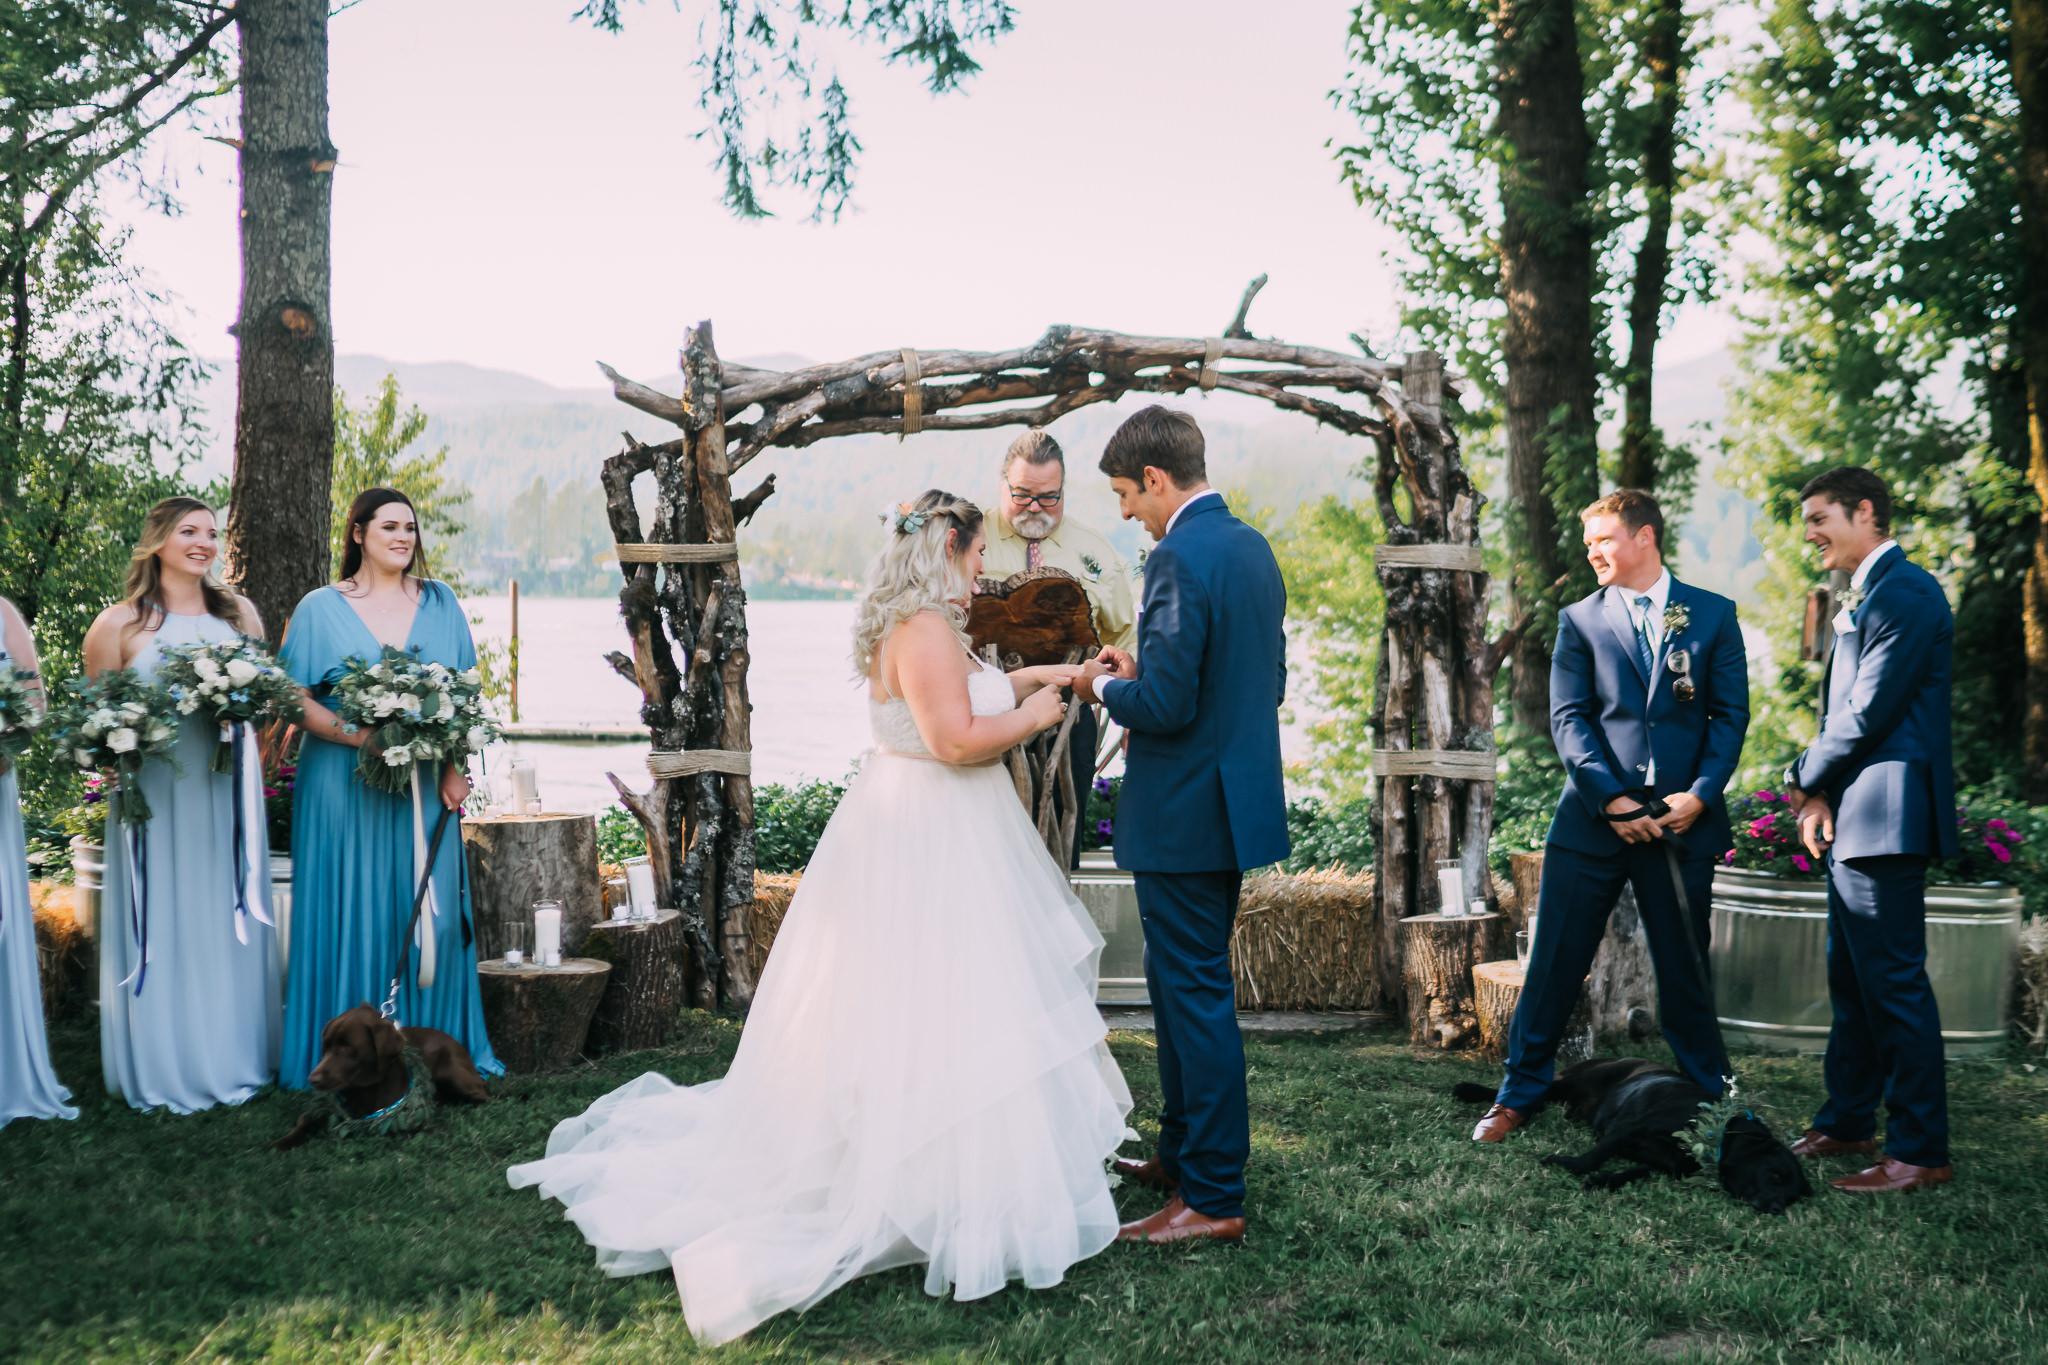 Bride groom exchange rings ceremony Mt hood River Gorge Portland wedding photographer